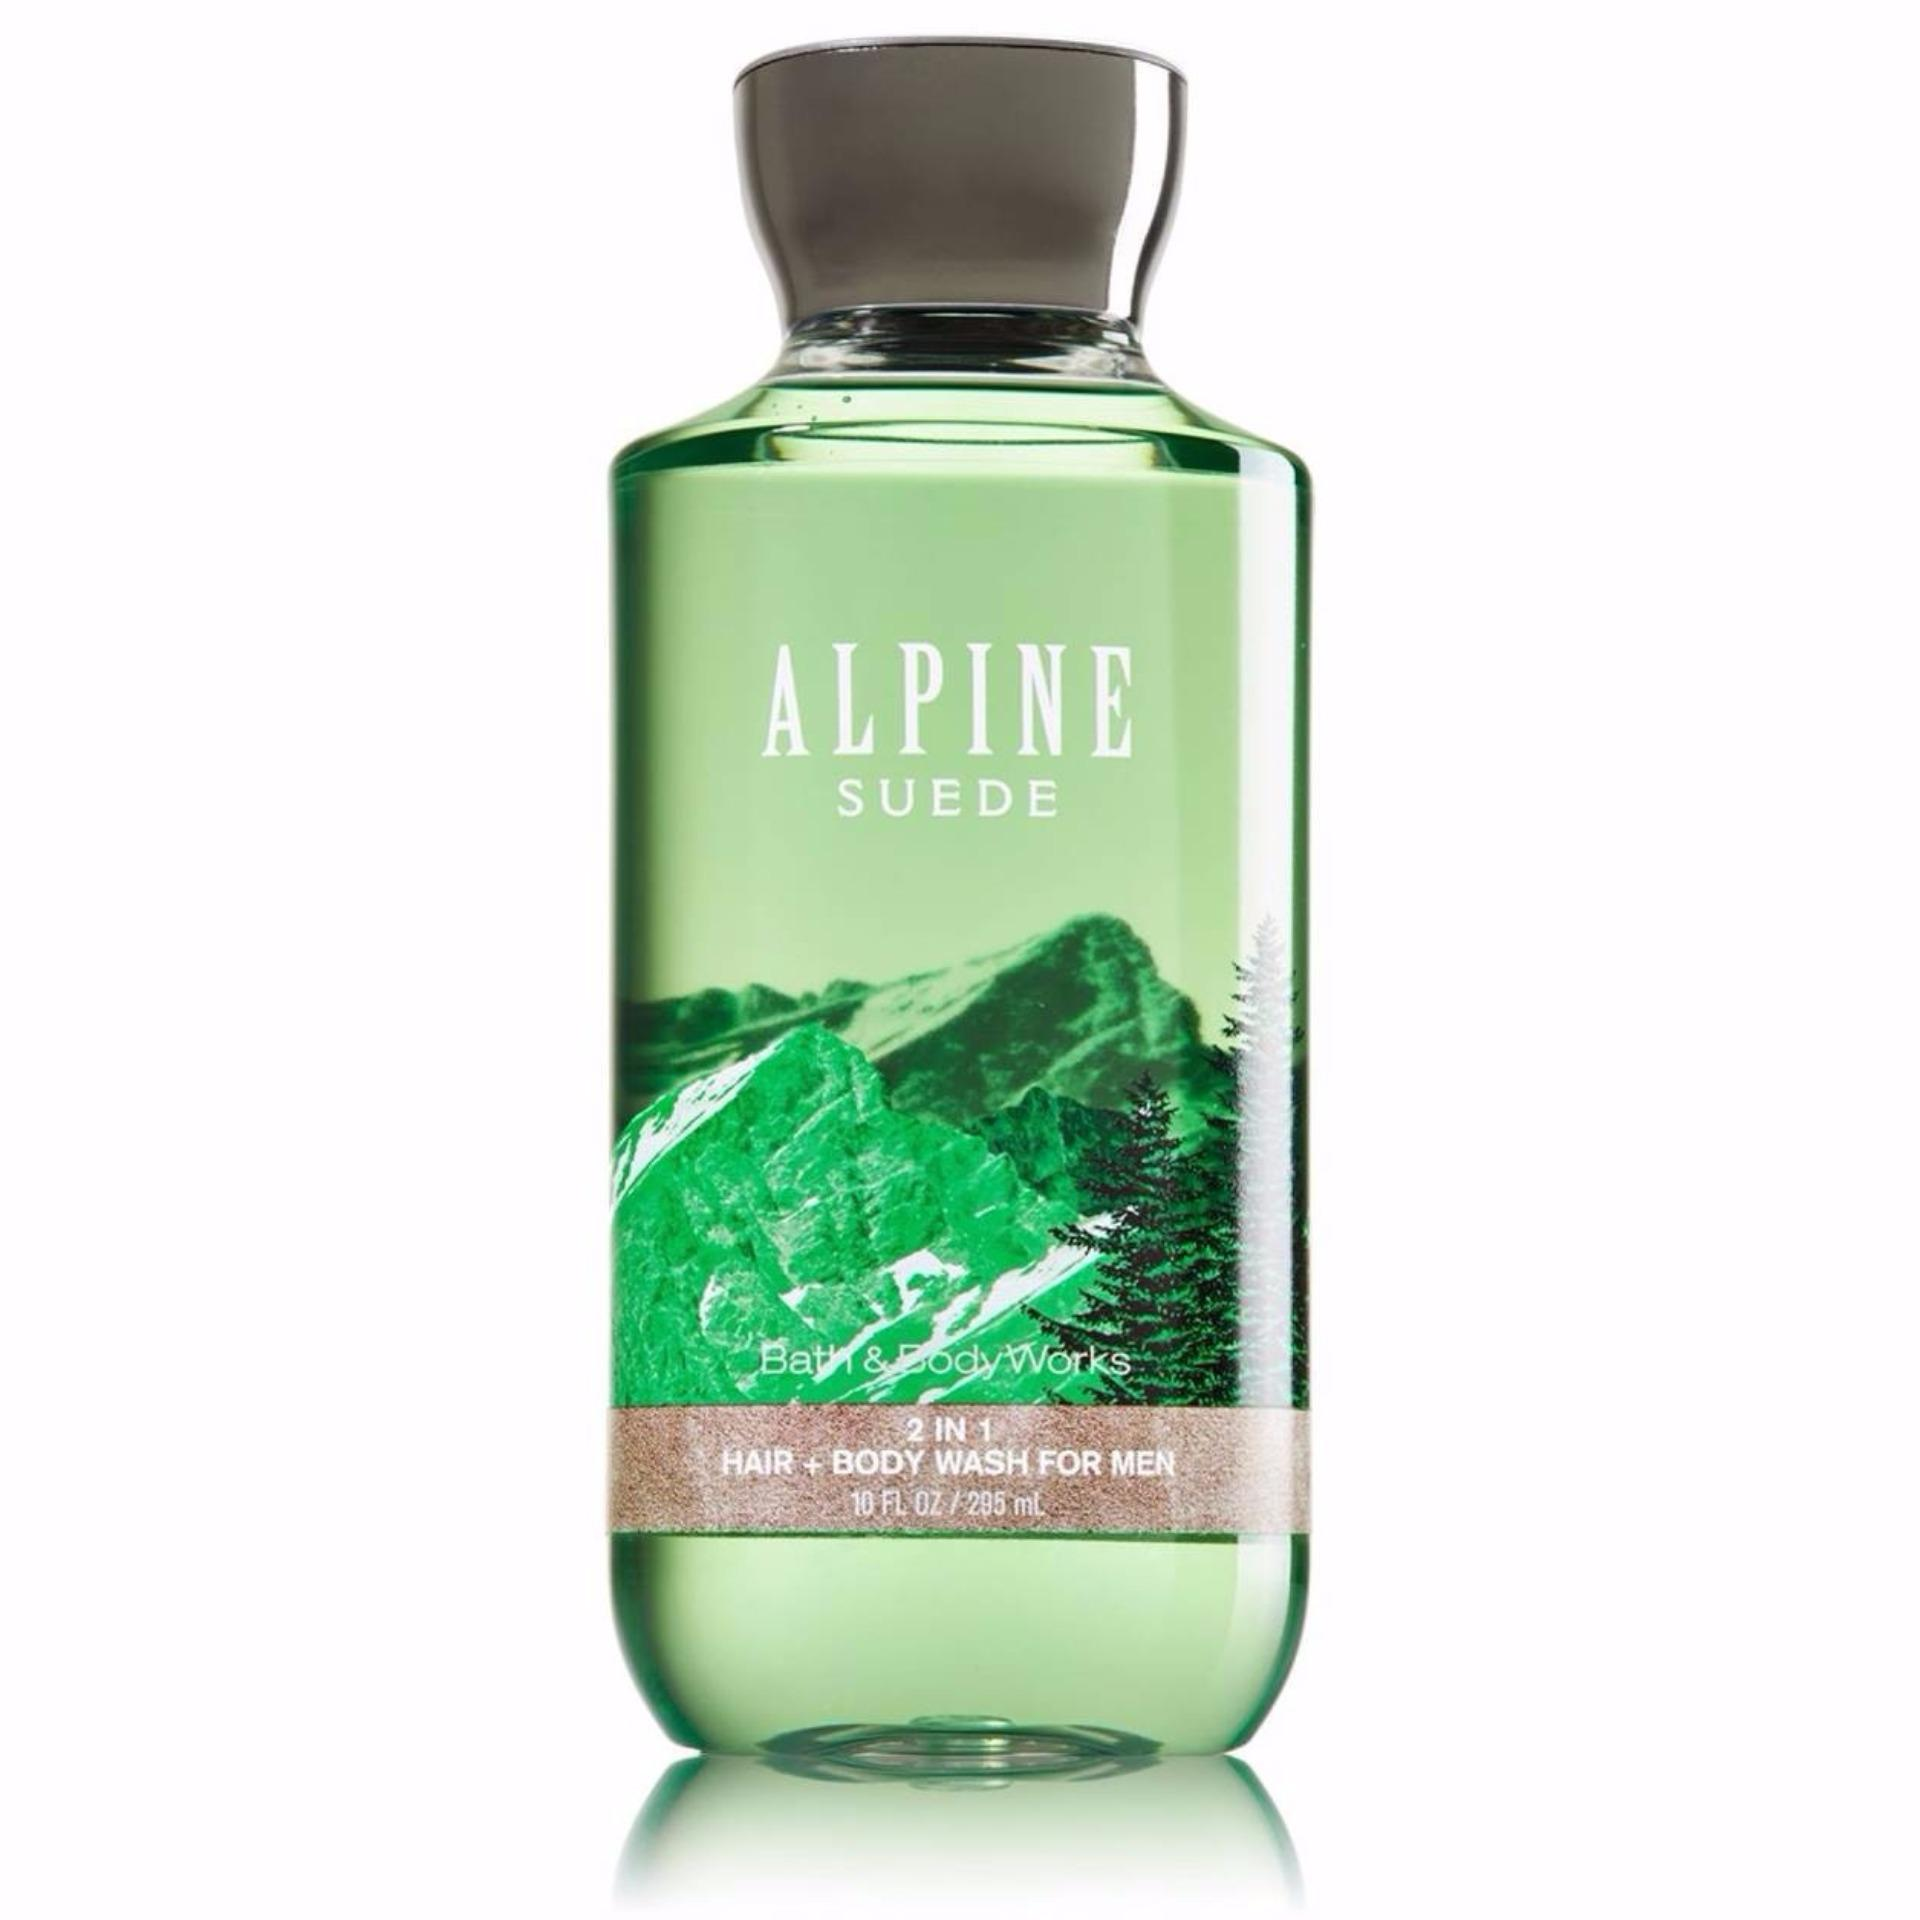 Tắm gội 2in1 cho nam Bath & Body Works for men 295ml #Alpine Suede nhập khẩu